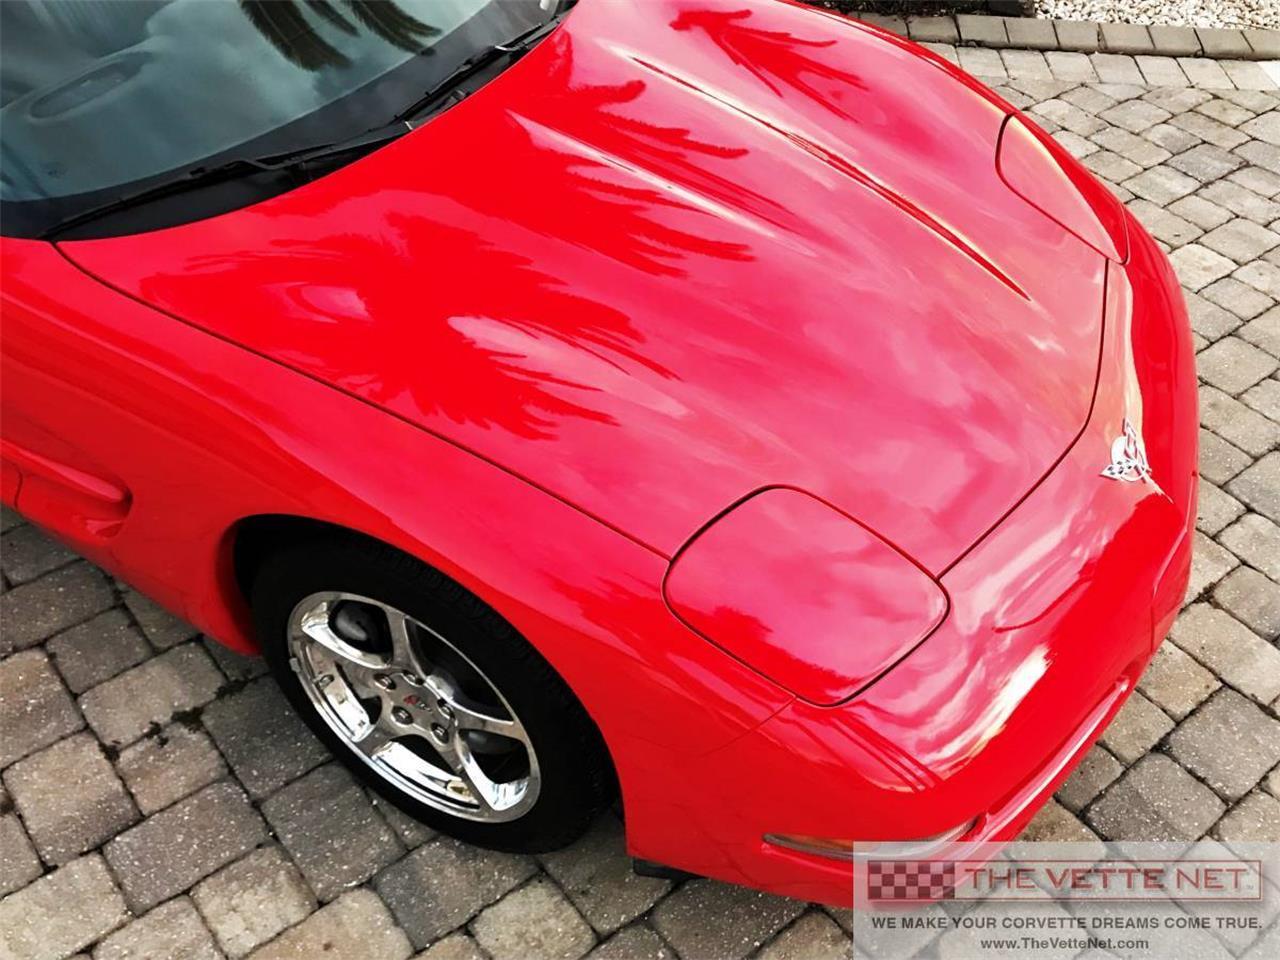 2003 Chevrolet Corvette (CC-1179028) for sale in Sarasota, Florida